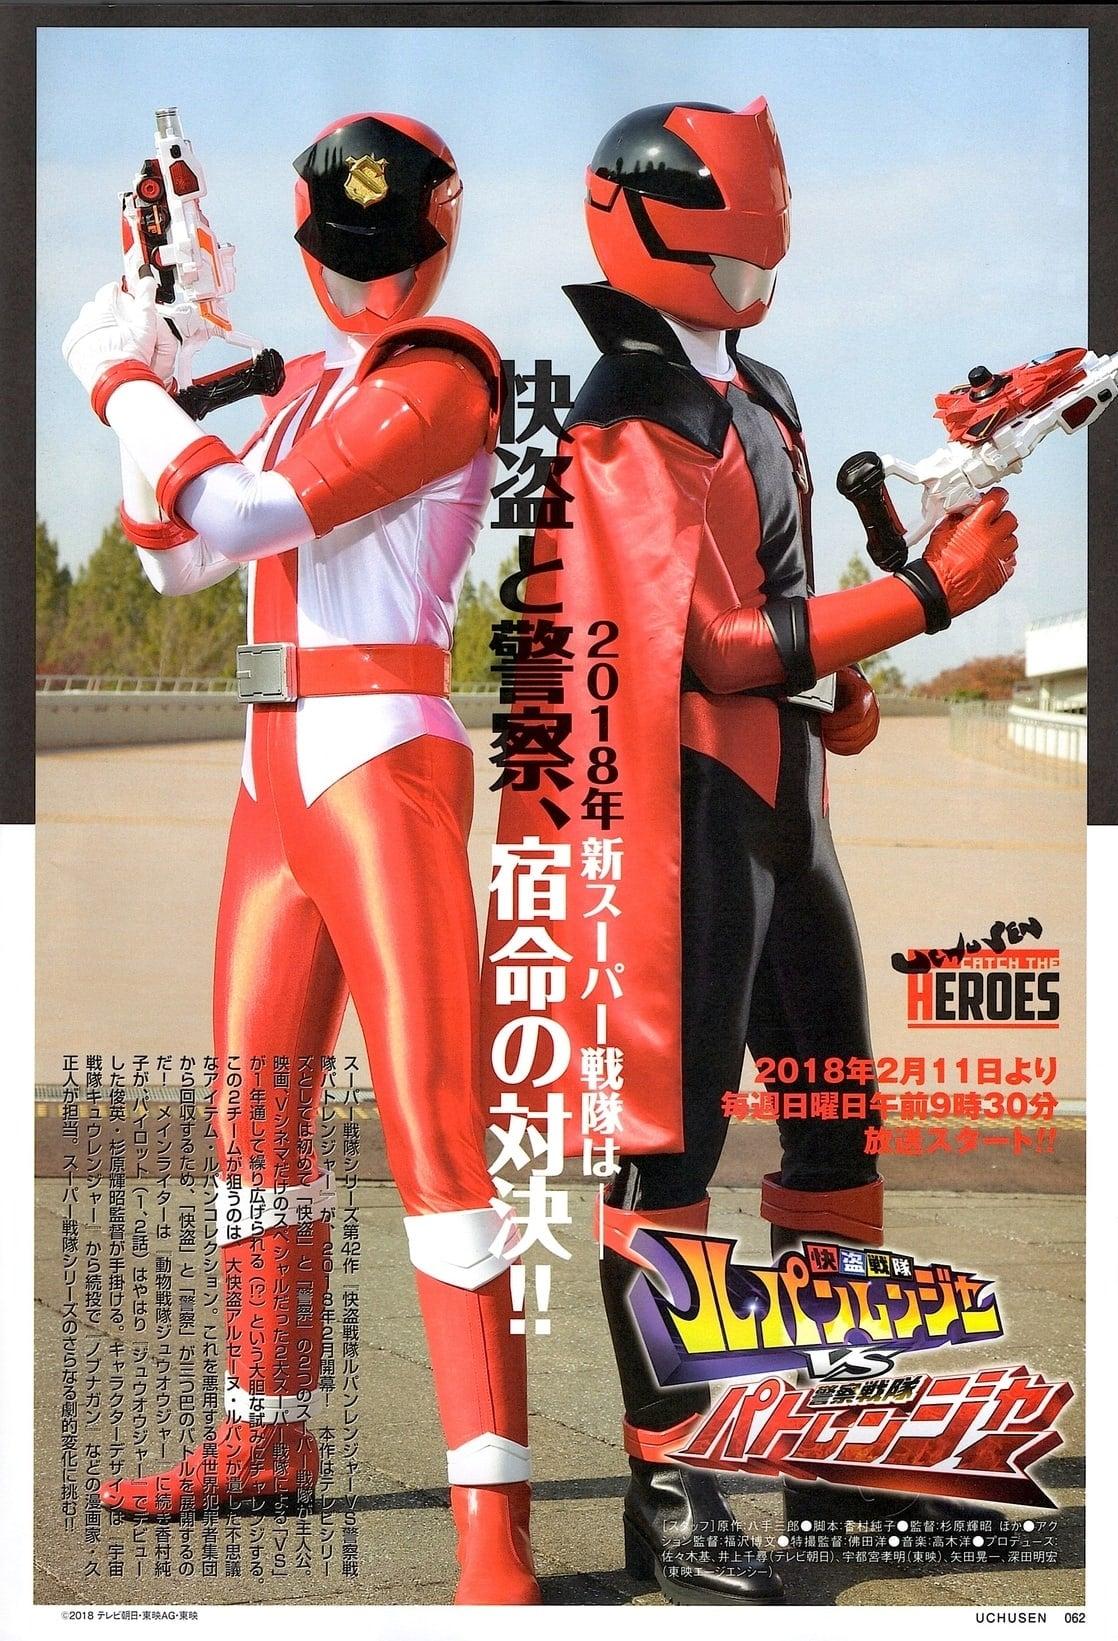 Kaitou Sentai Lupinranger VS Keisatsu Sentai Patranger (2018)